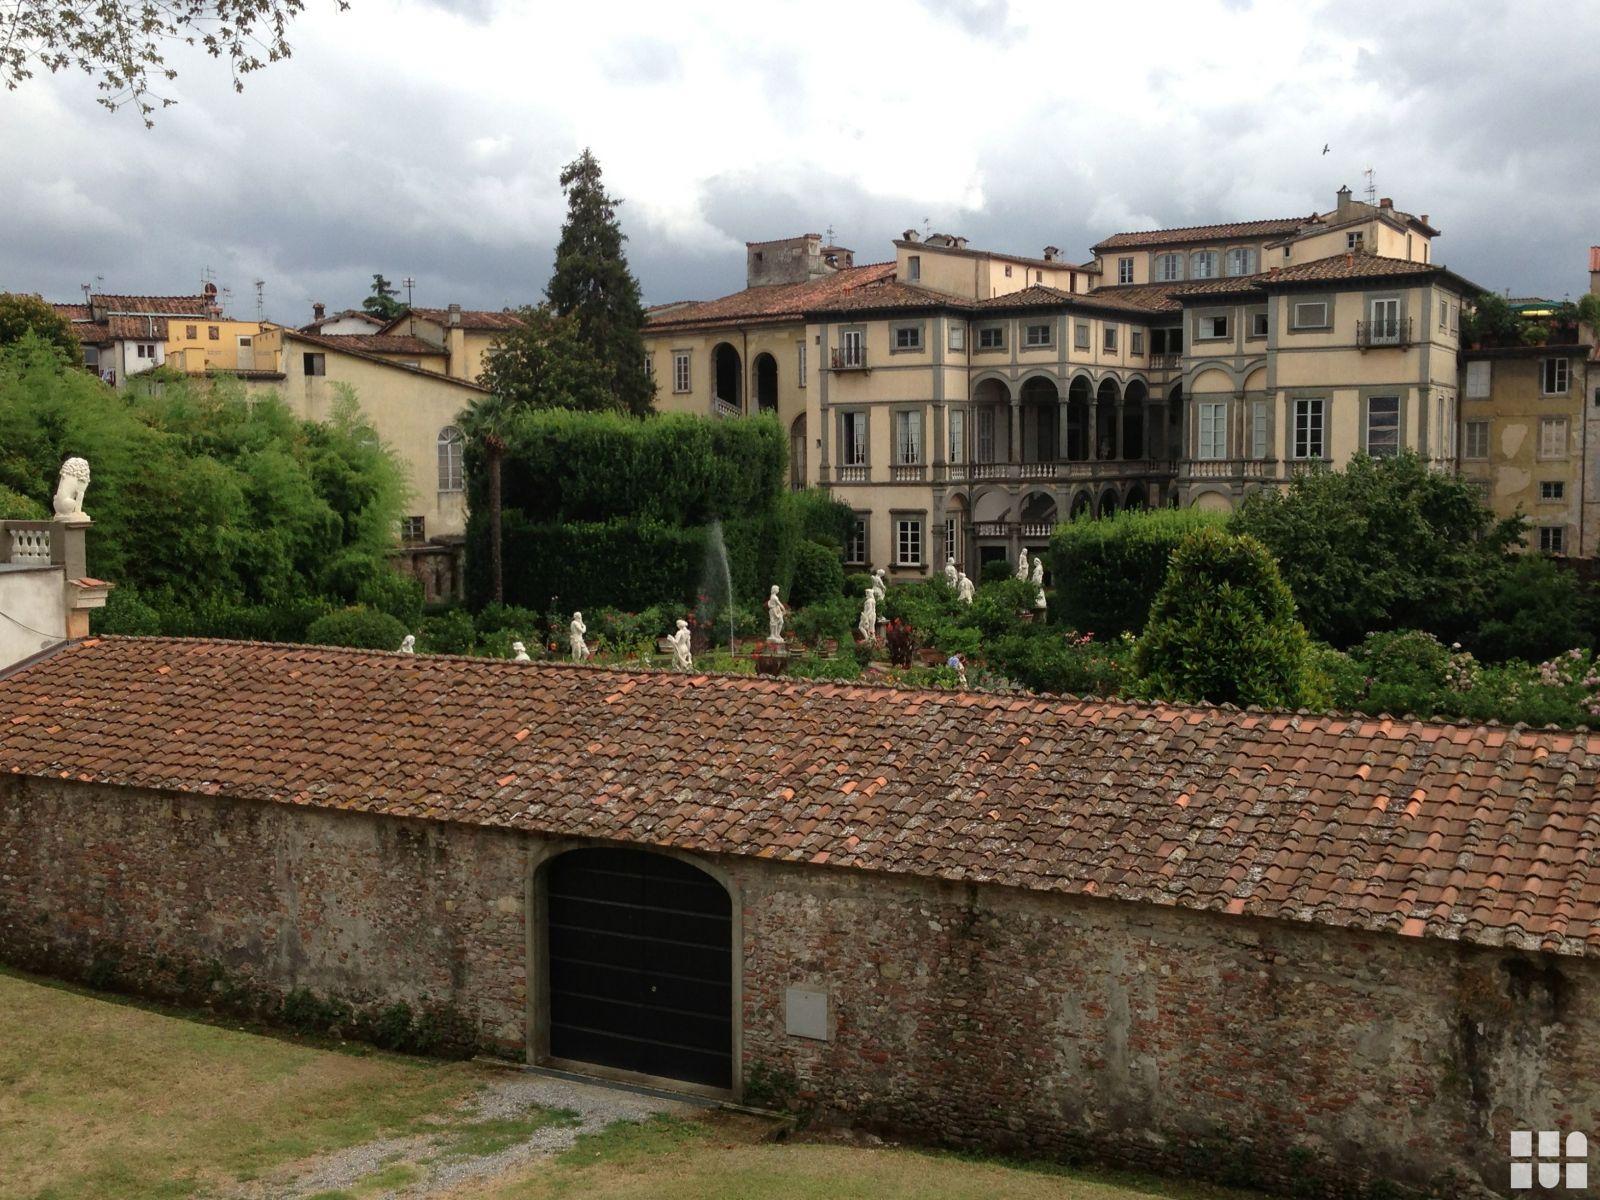 Gärten in Lucca